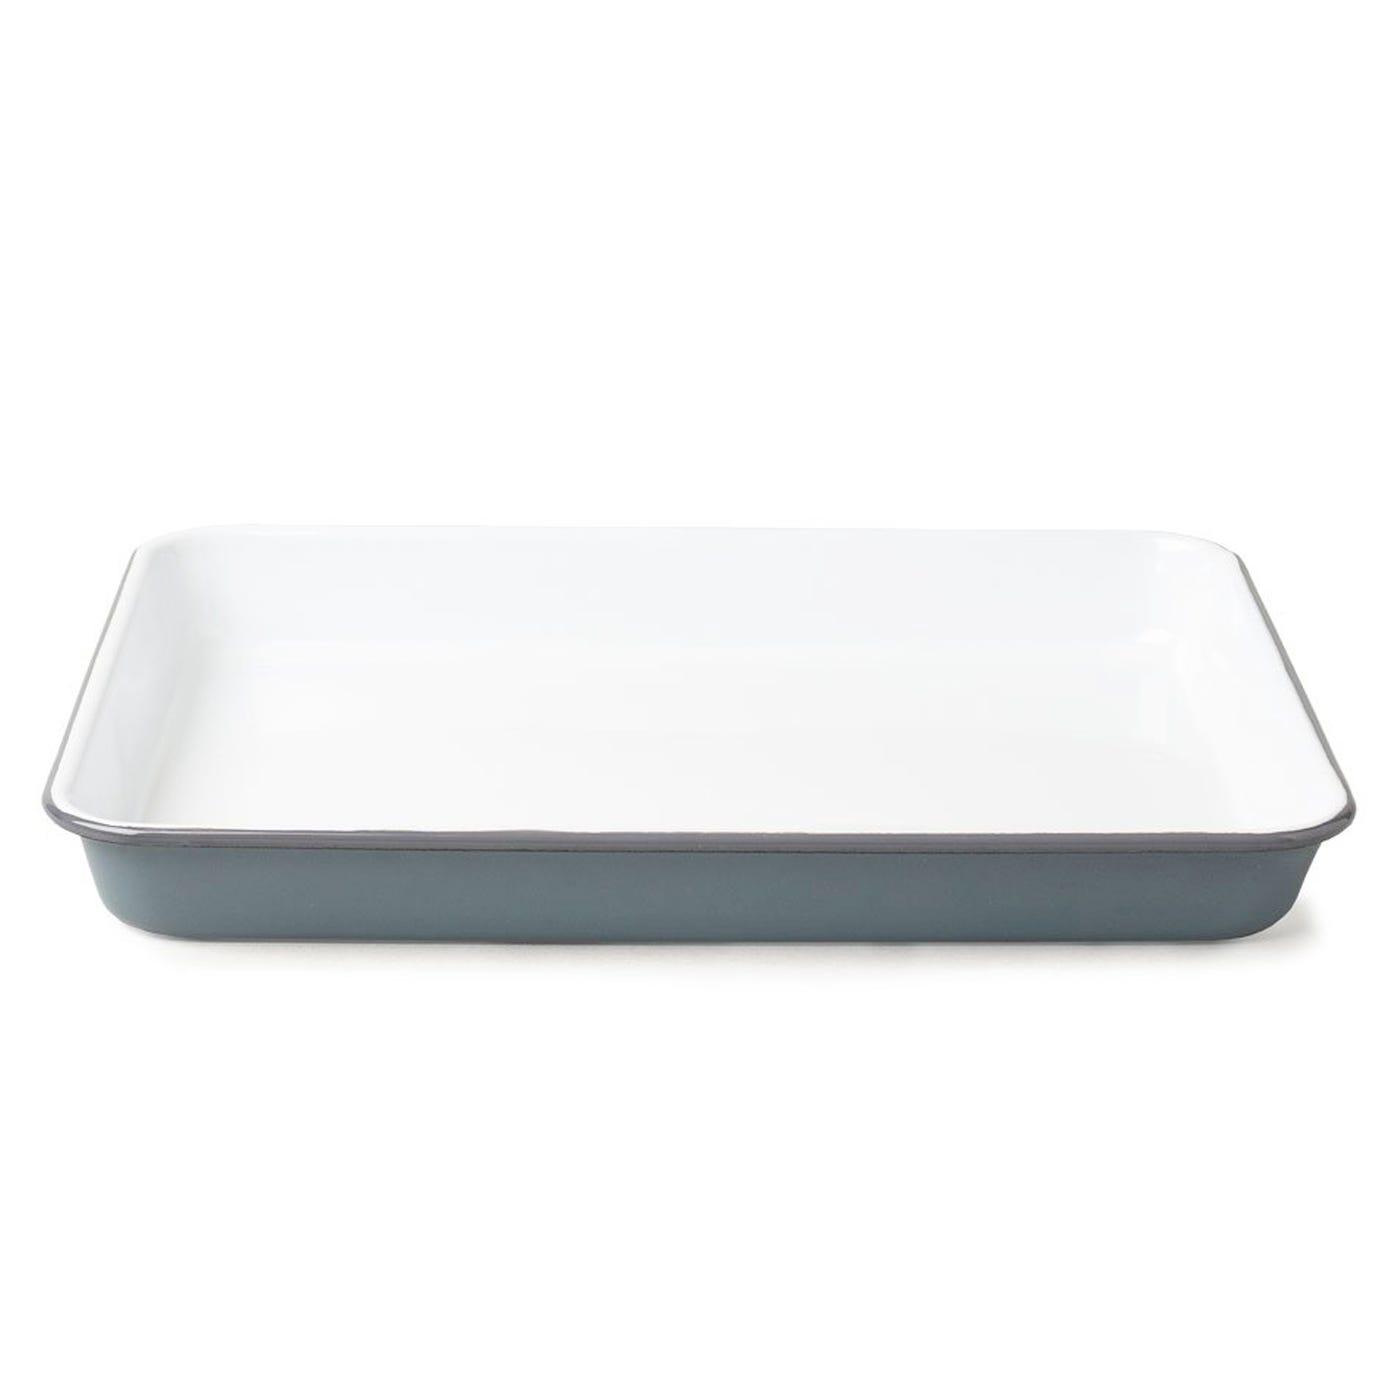 Falcon Enamelware Tray Grey